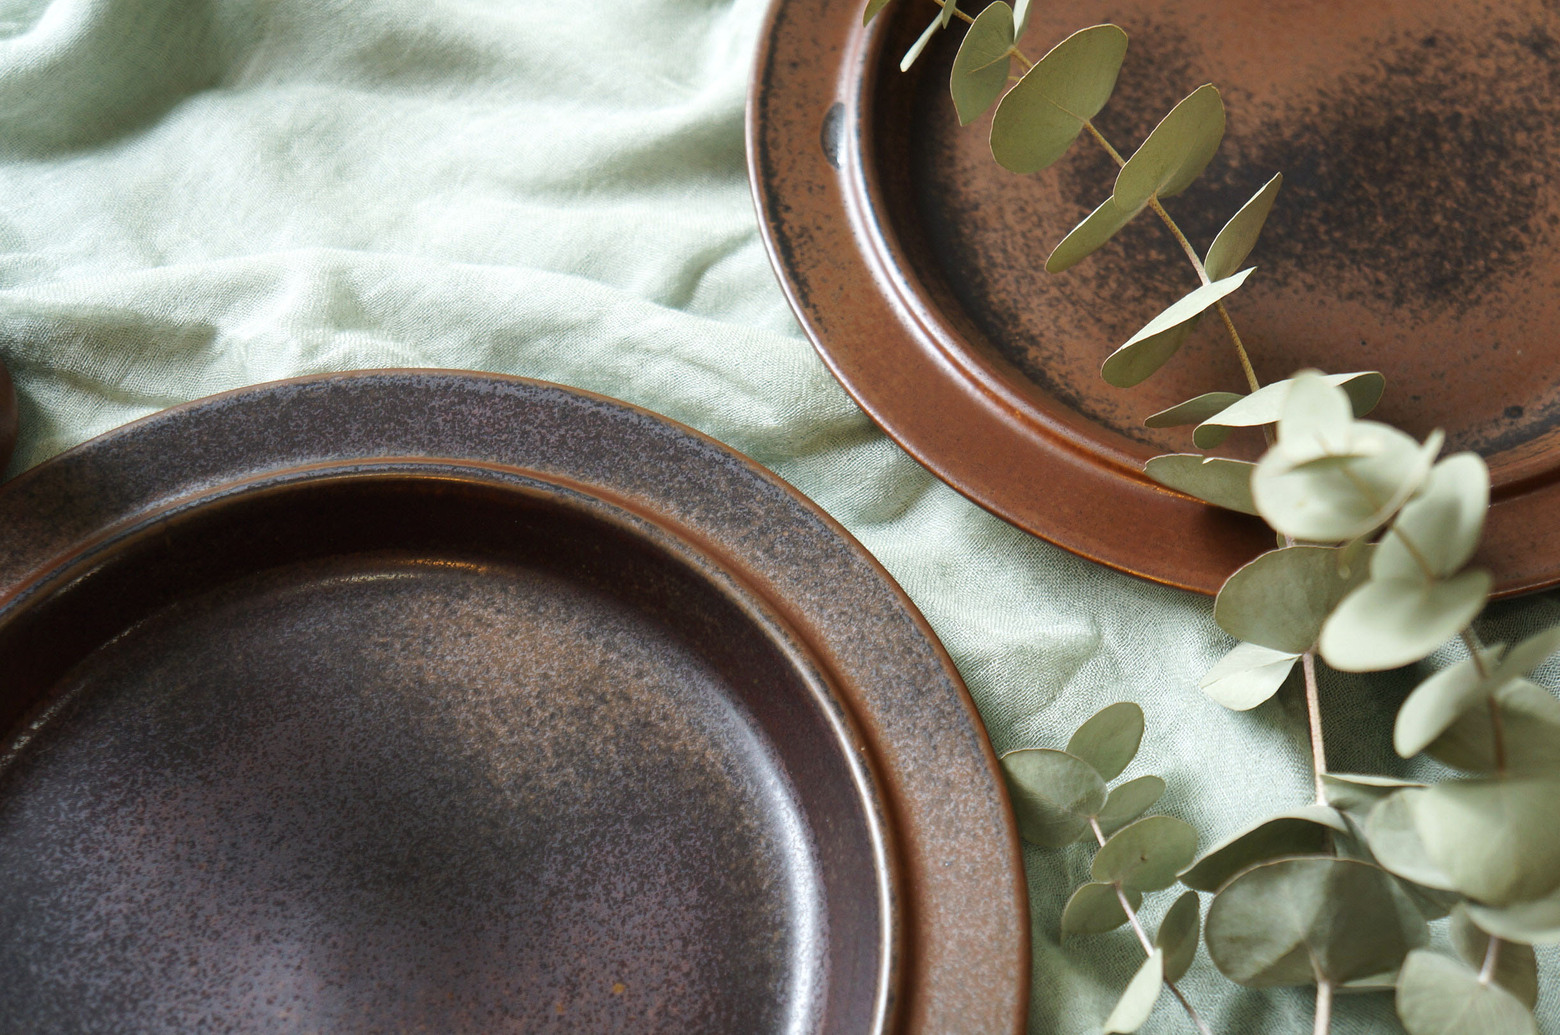 ARABIA Ruska Dinner Plate 25.5cm Ulla Procope/アラビア ルスカ ディナープレート ウラ・プロコッペ フィンランド ヴィンテージ 北欧食器